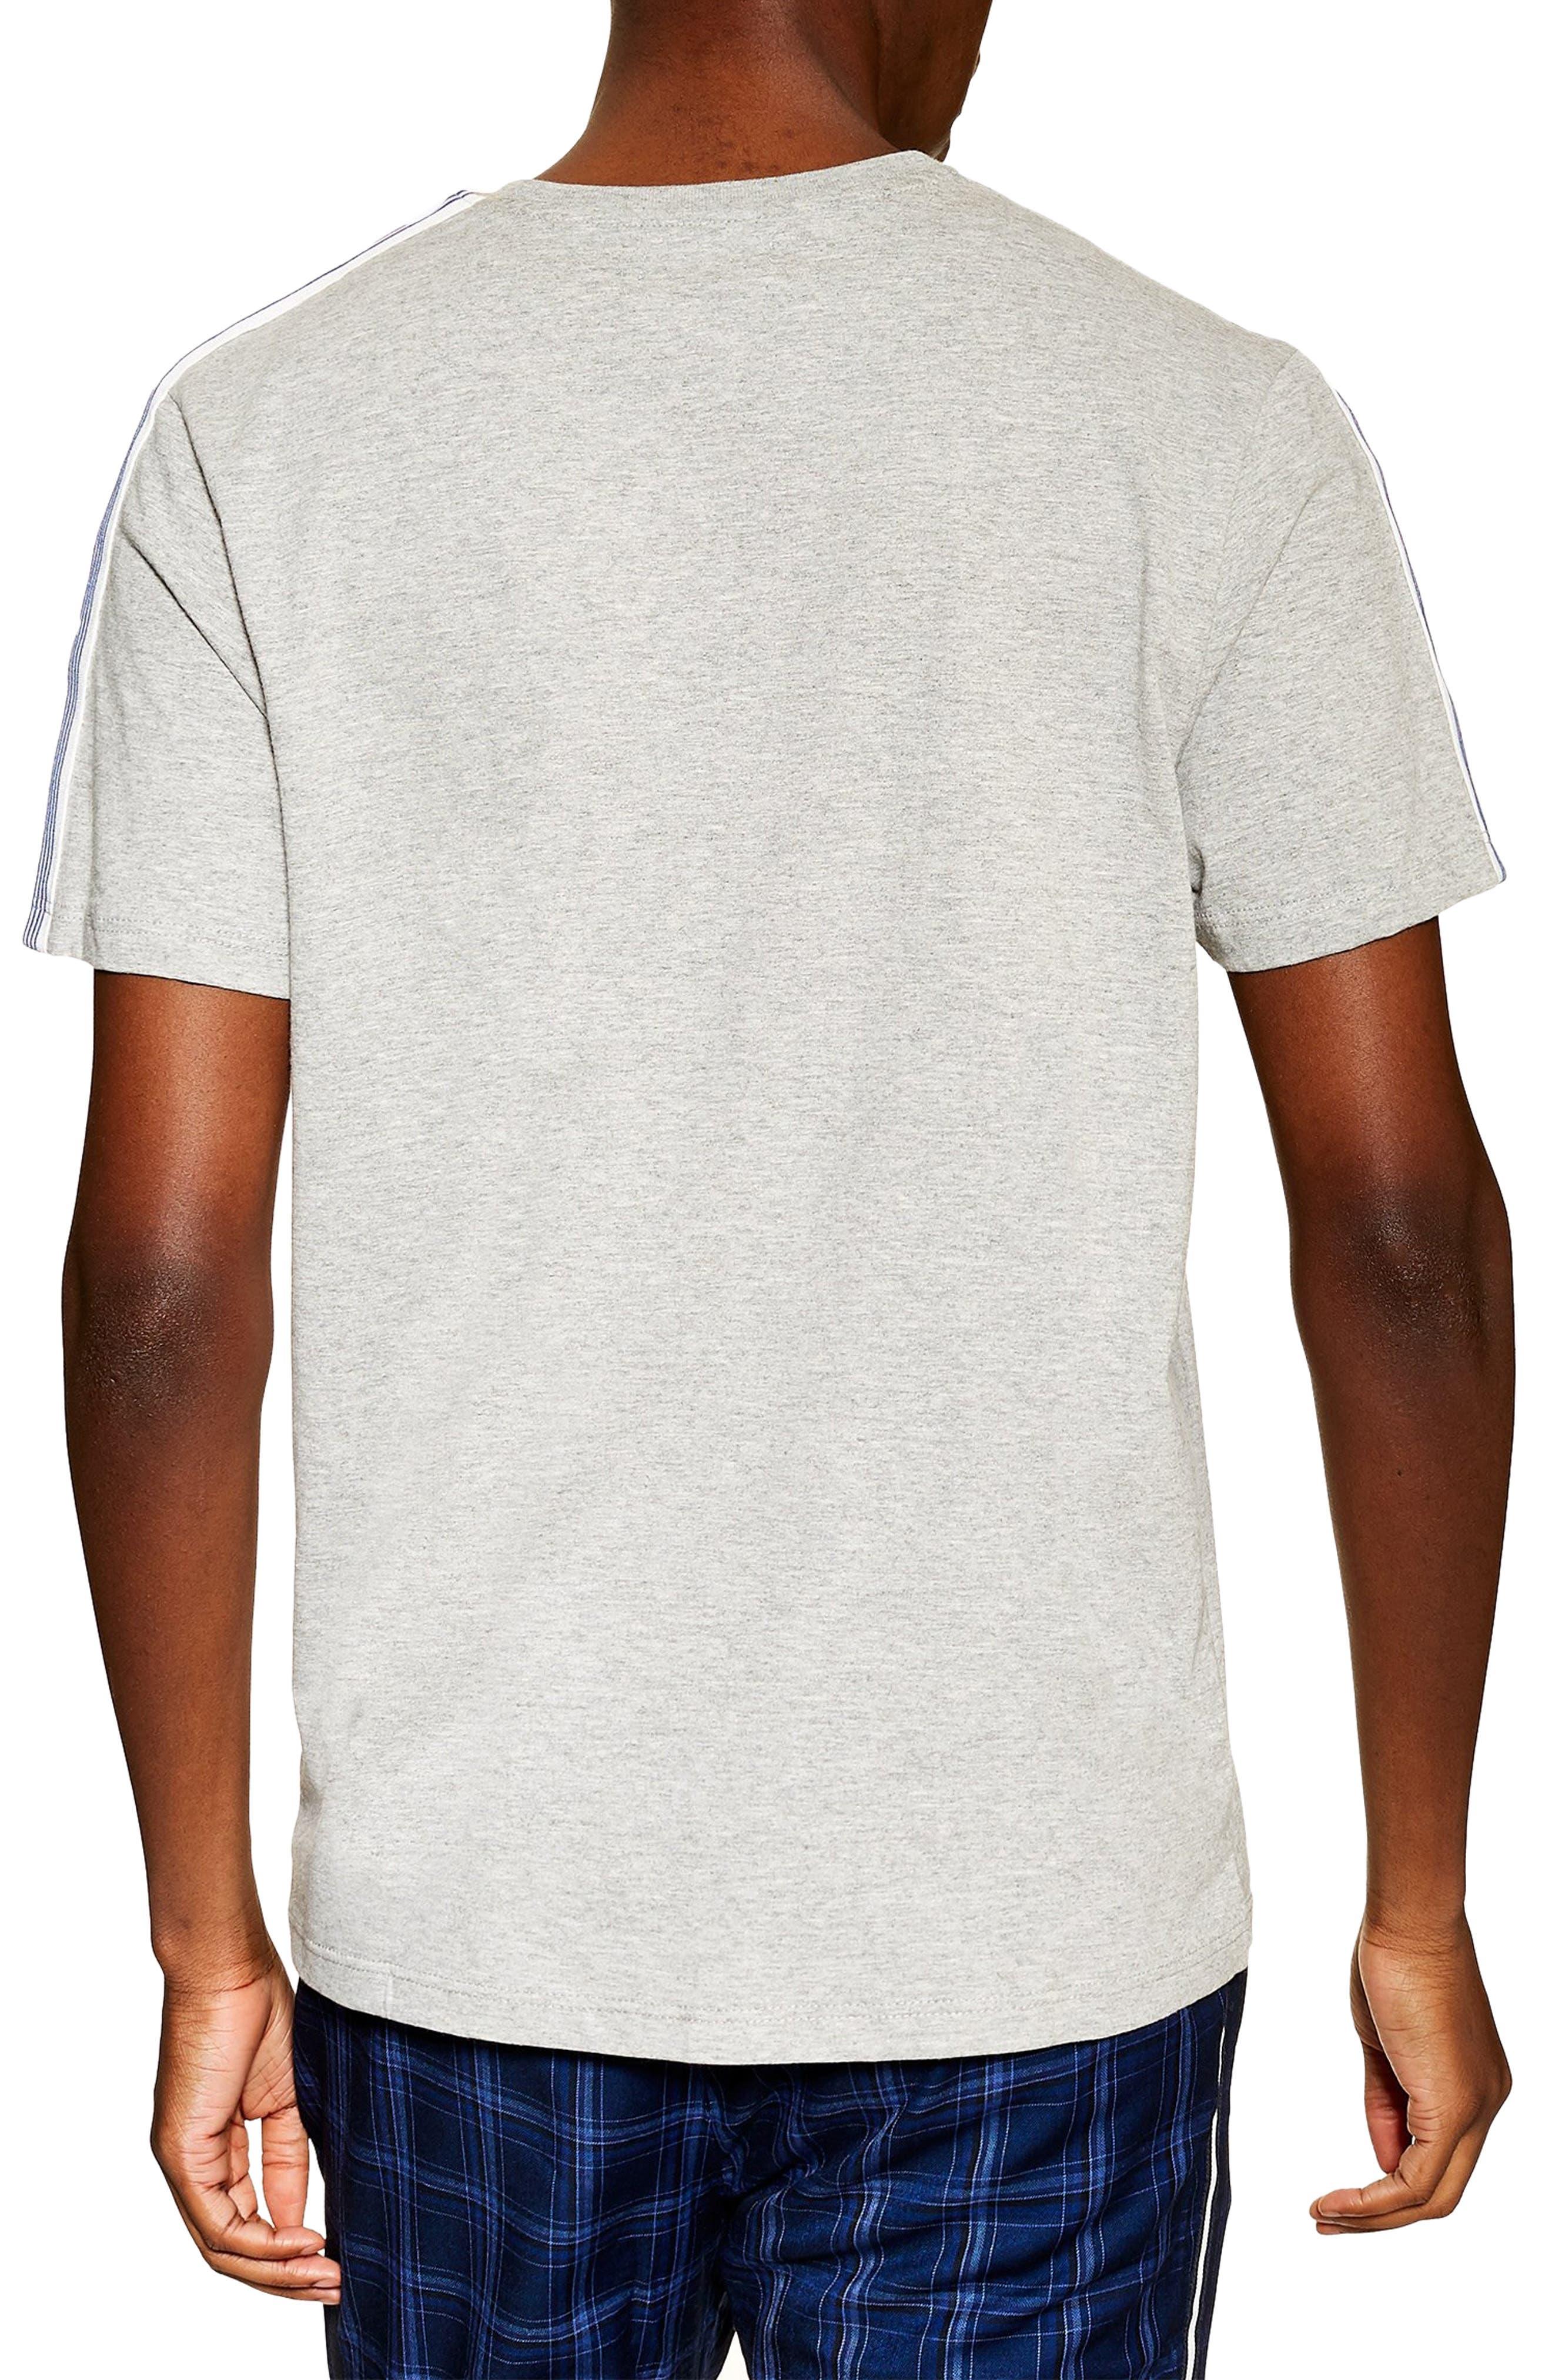 7d8f6233 Men's Topman T-Shirts, Tank Tops, & Graphic Tees   Nordstrom